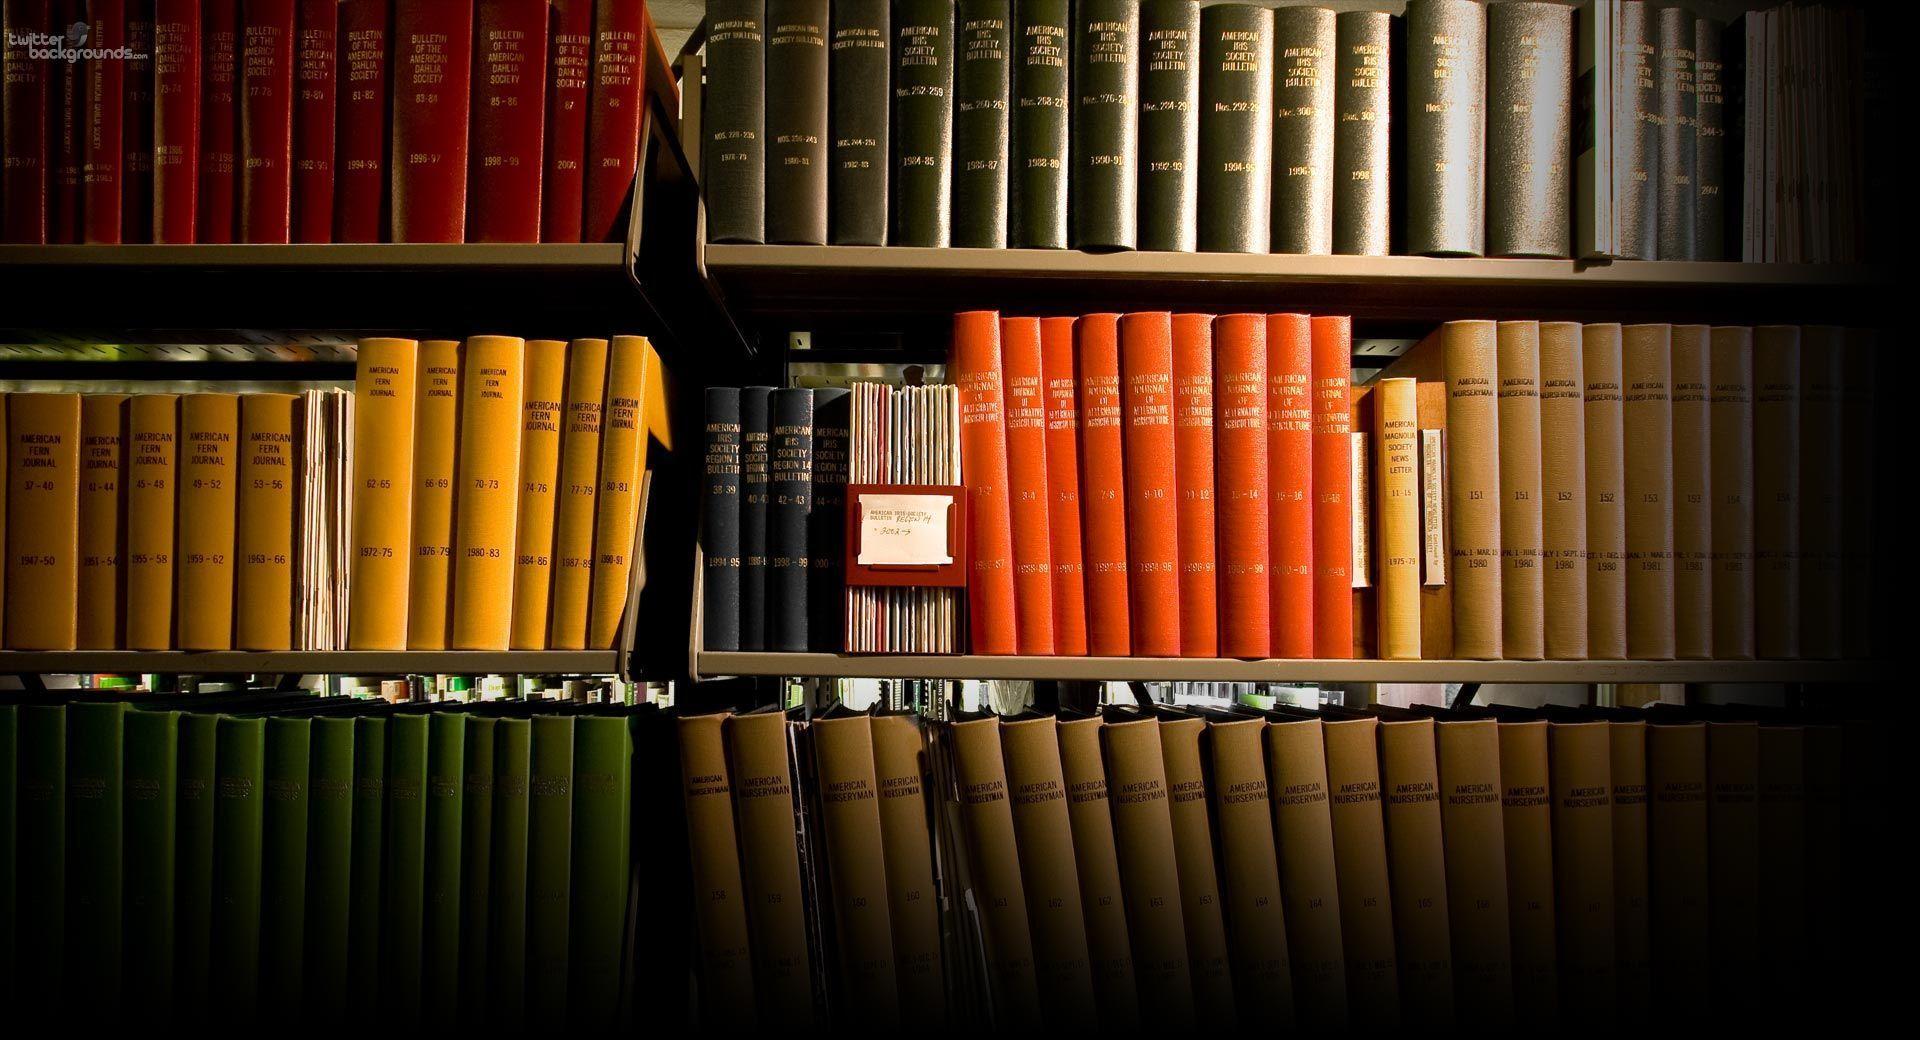 books-on-shelf-background